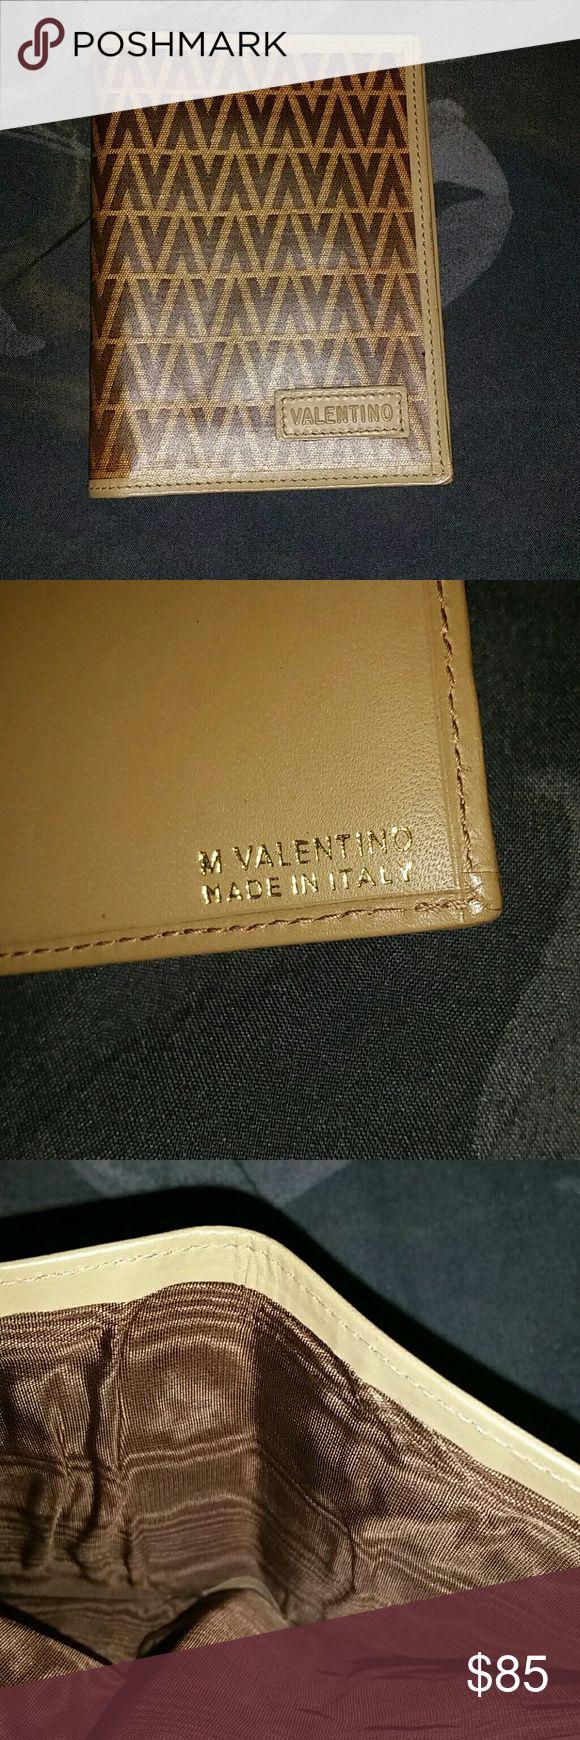 VALENTINO wallet A brown and tan Valentino wallet. Valentino Bags Wallets